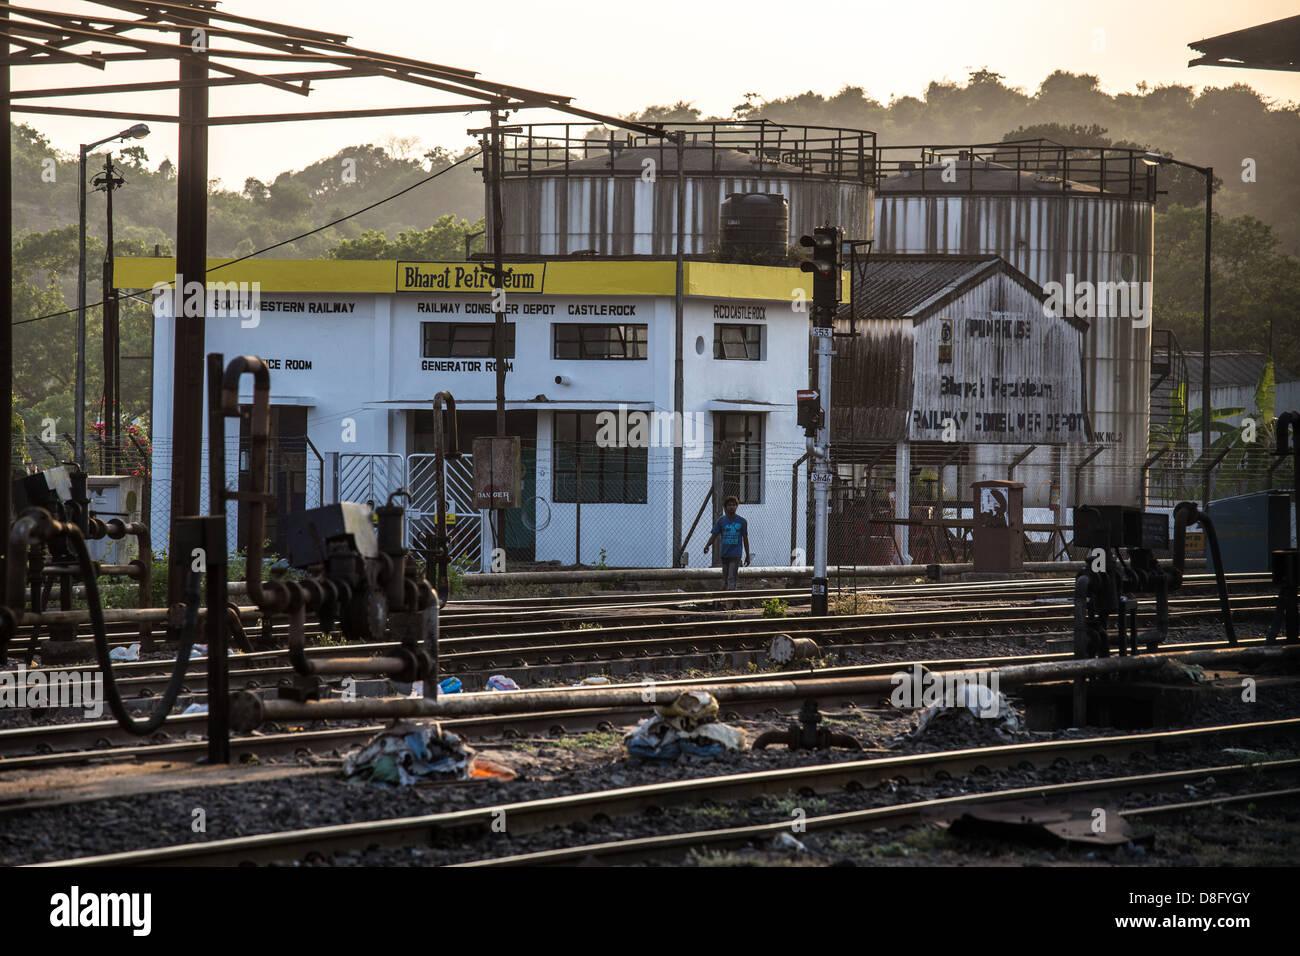 bharat petroleum depot at castlerock railway station all free downloads vector art all free download vector images